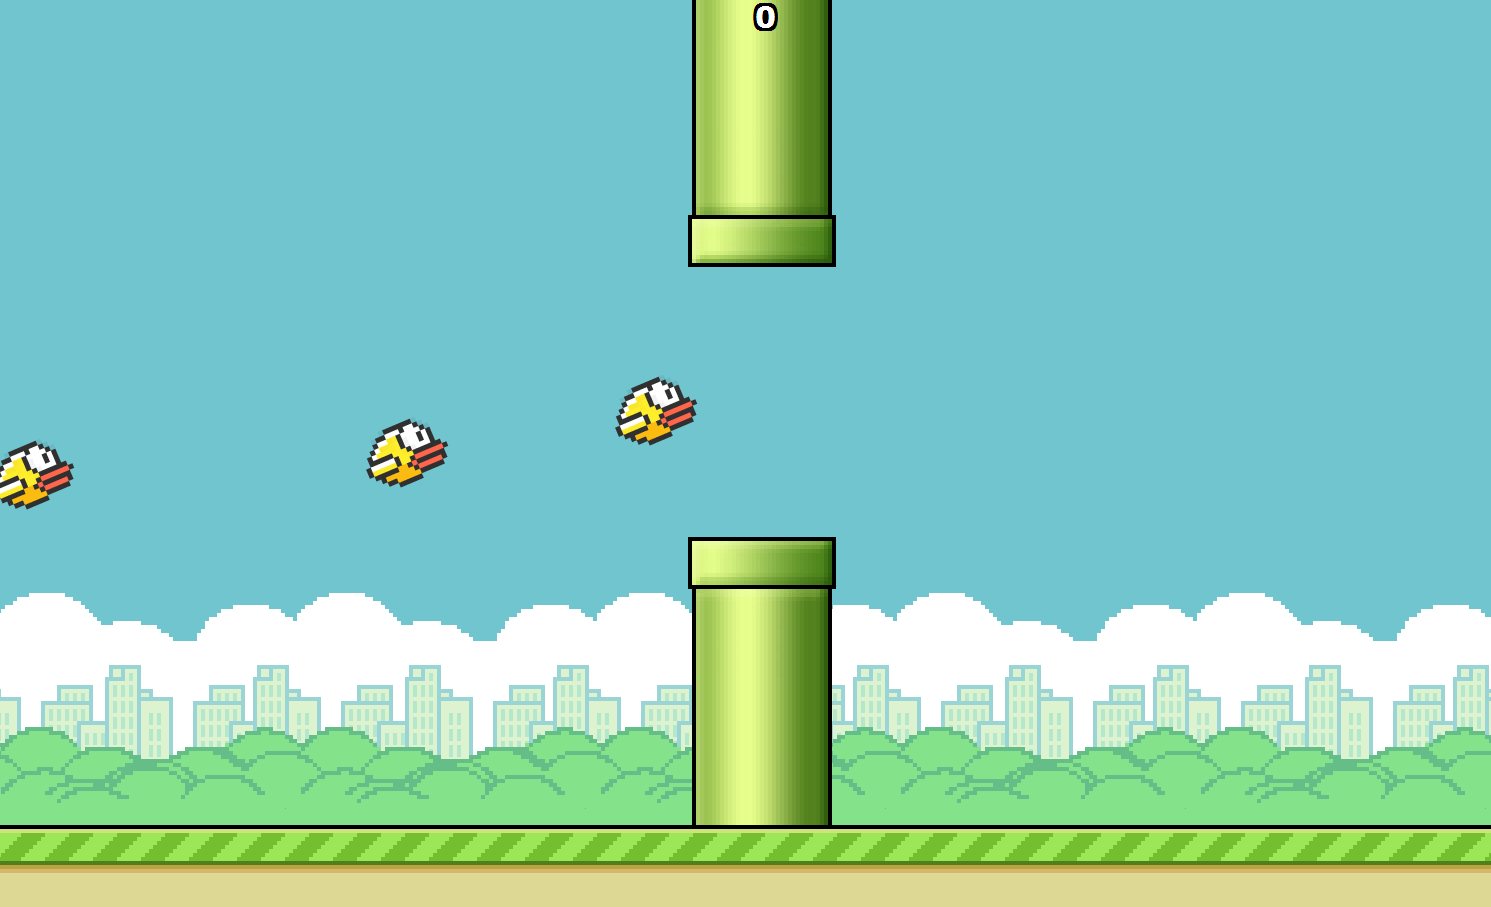 The Flappy Bird Symphony